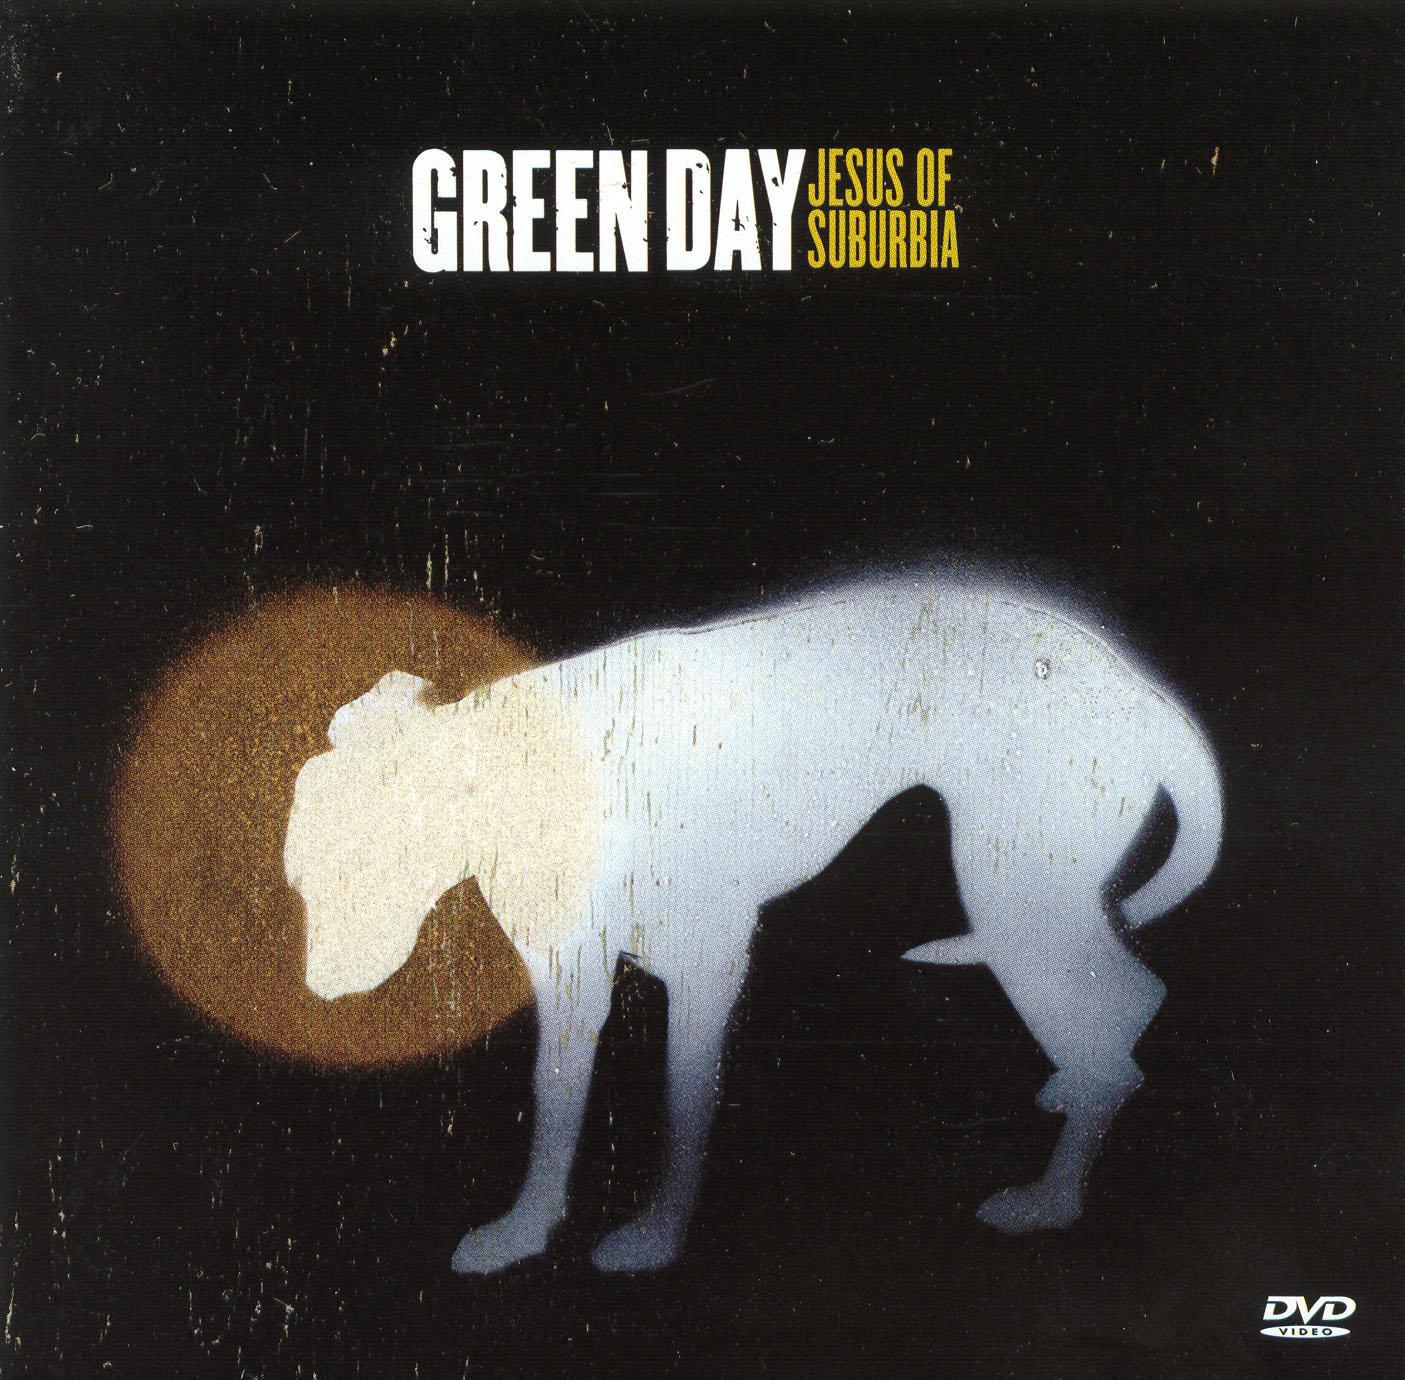 Green Day: Jesus of Suburbia [DVD Single]